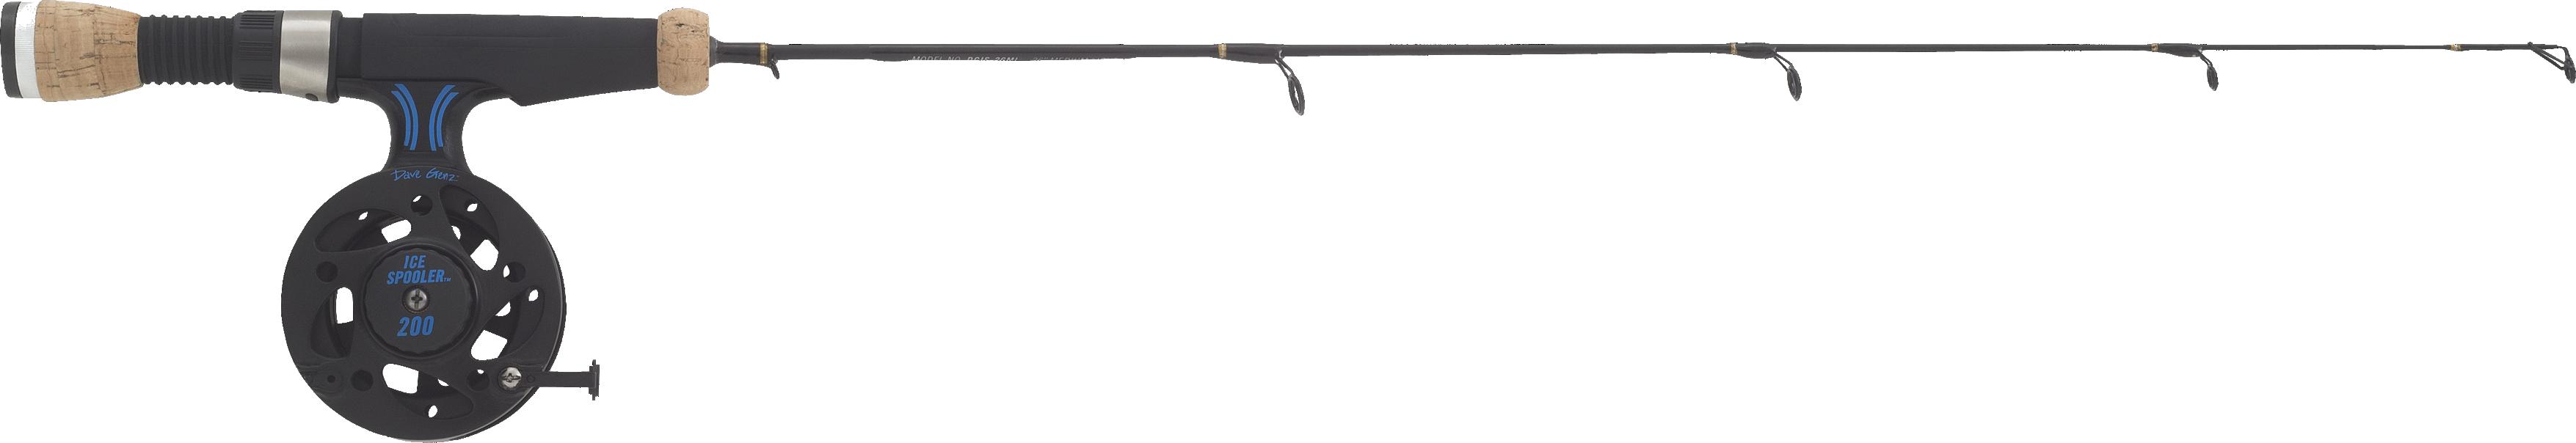 Fishing Rod PNG Image